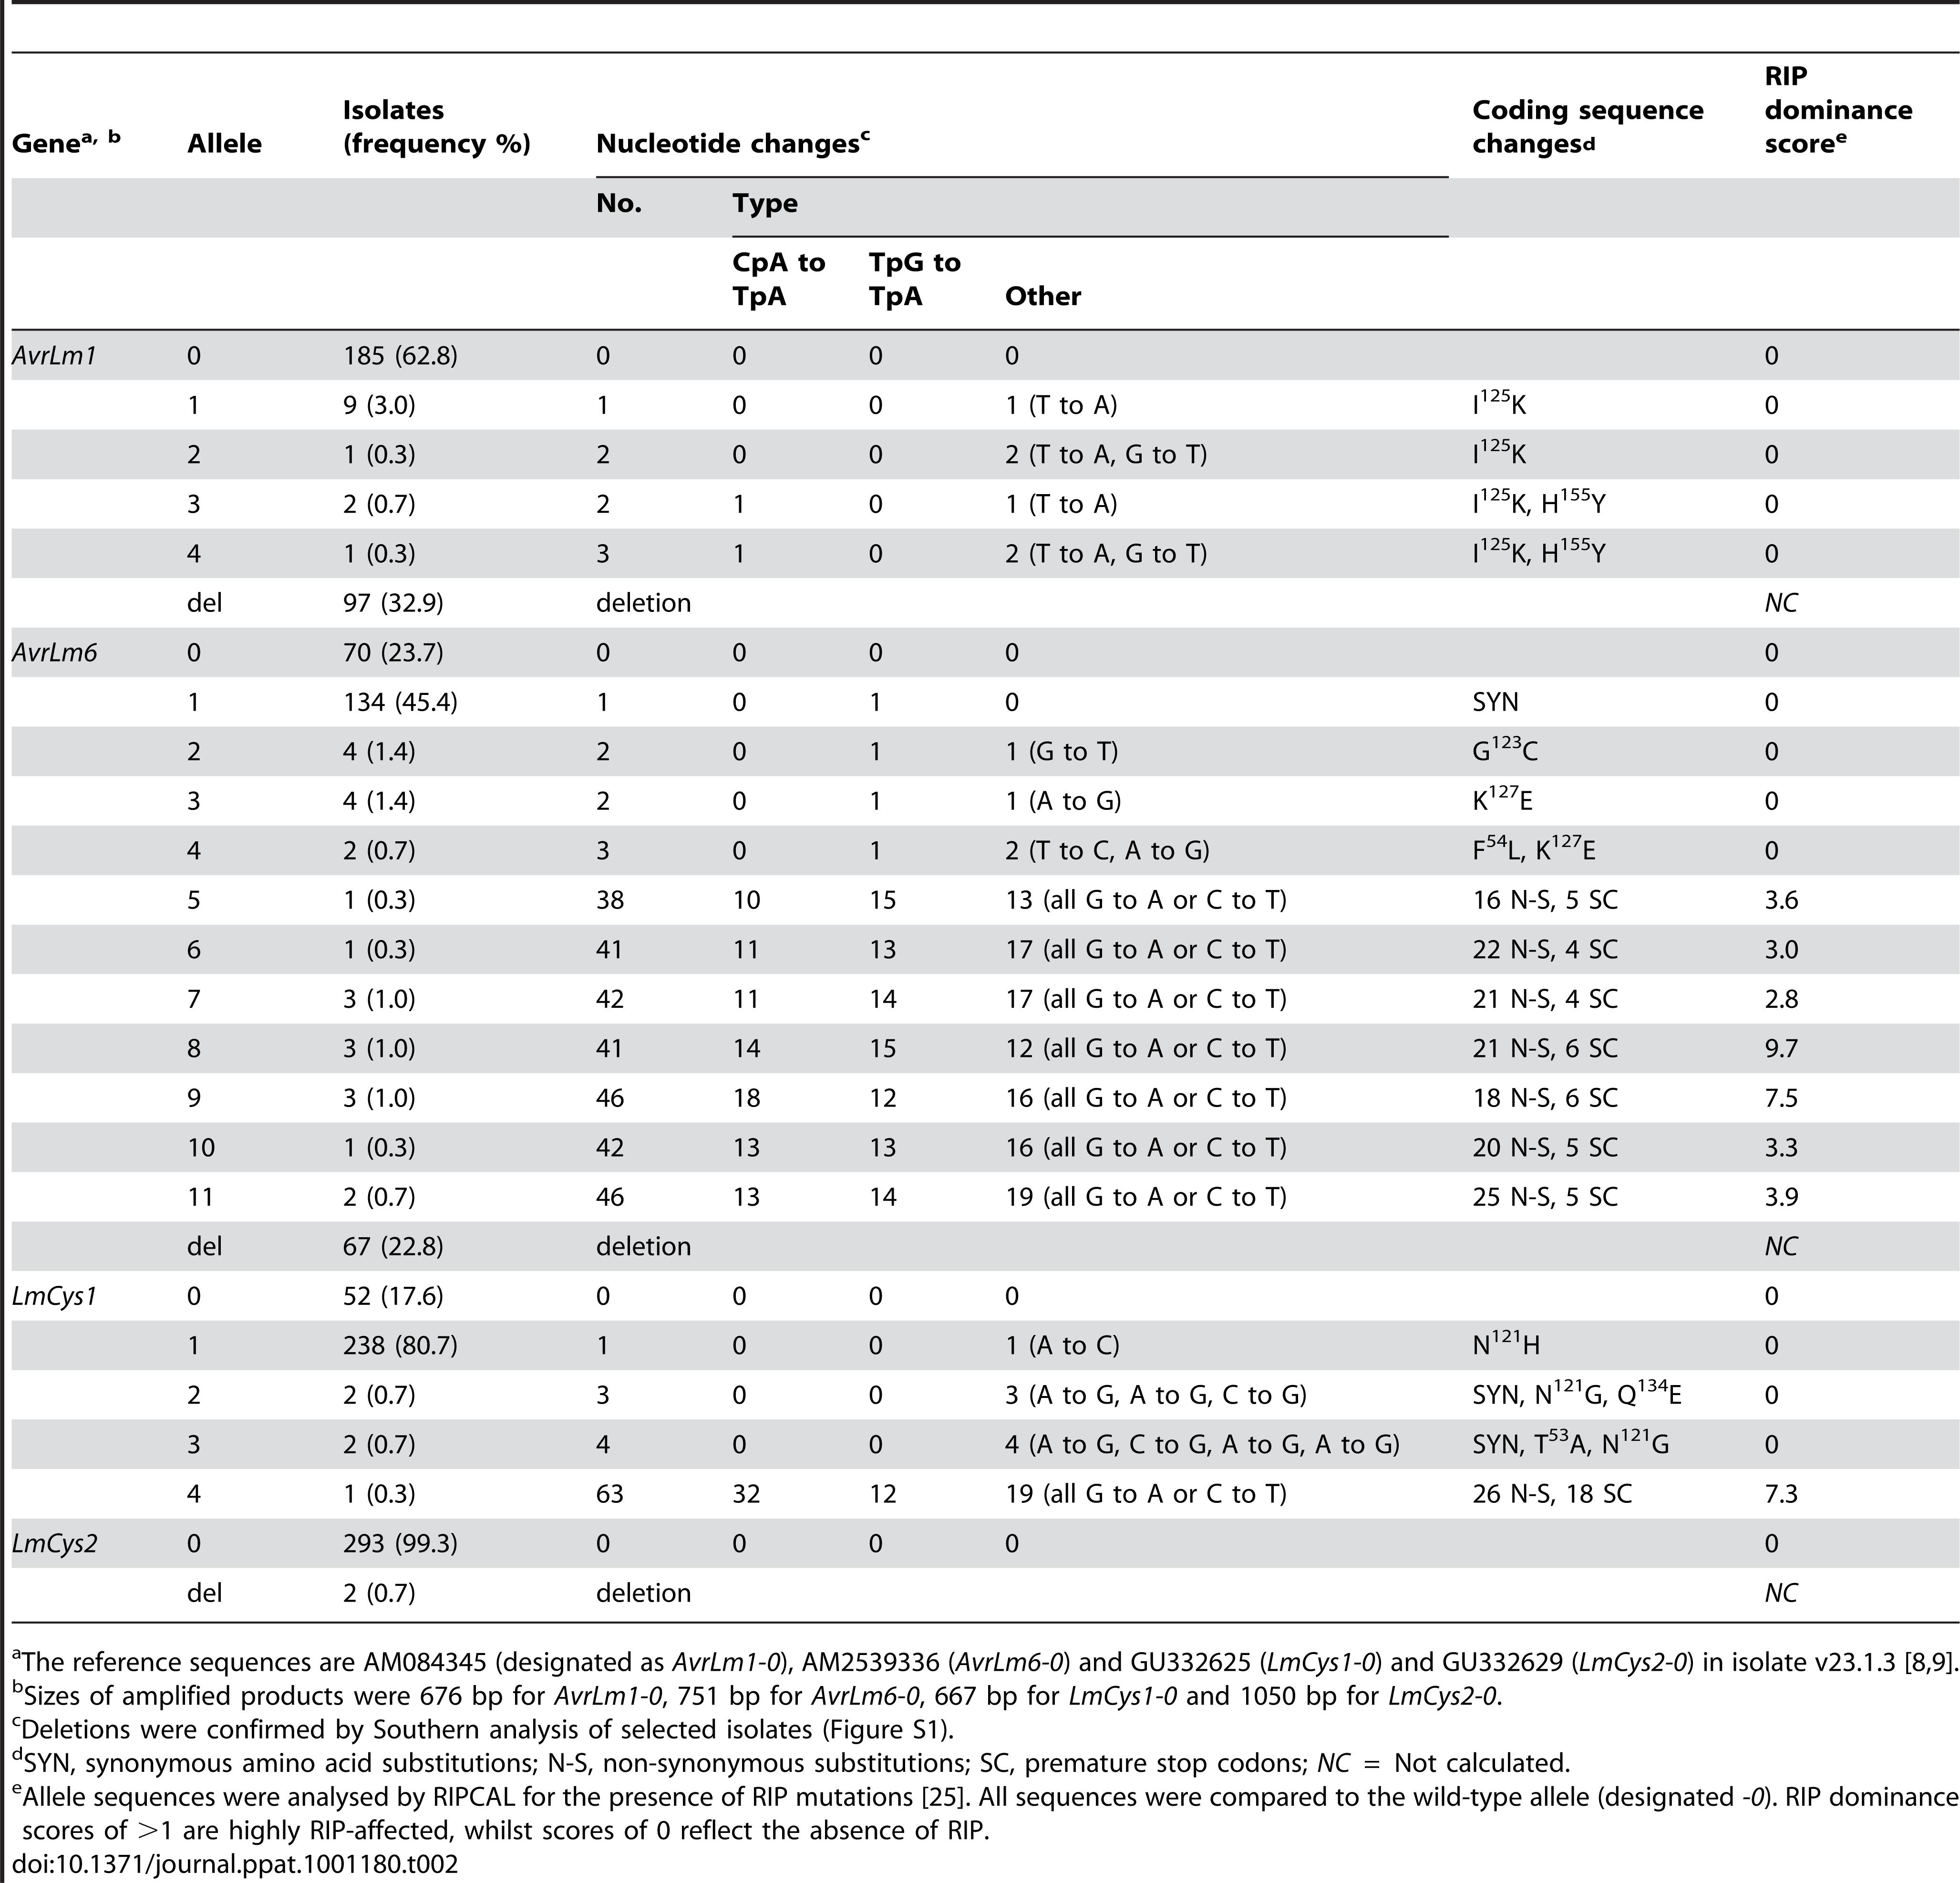 Alleles of <i>AvrLm1</i>, <i>AvrLm6, LmCys1</i> and <i>LmCys2</i> in 295 Australian isolates of <i>Leptosphaeria maculans</i>.